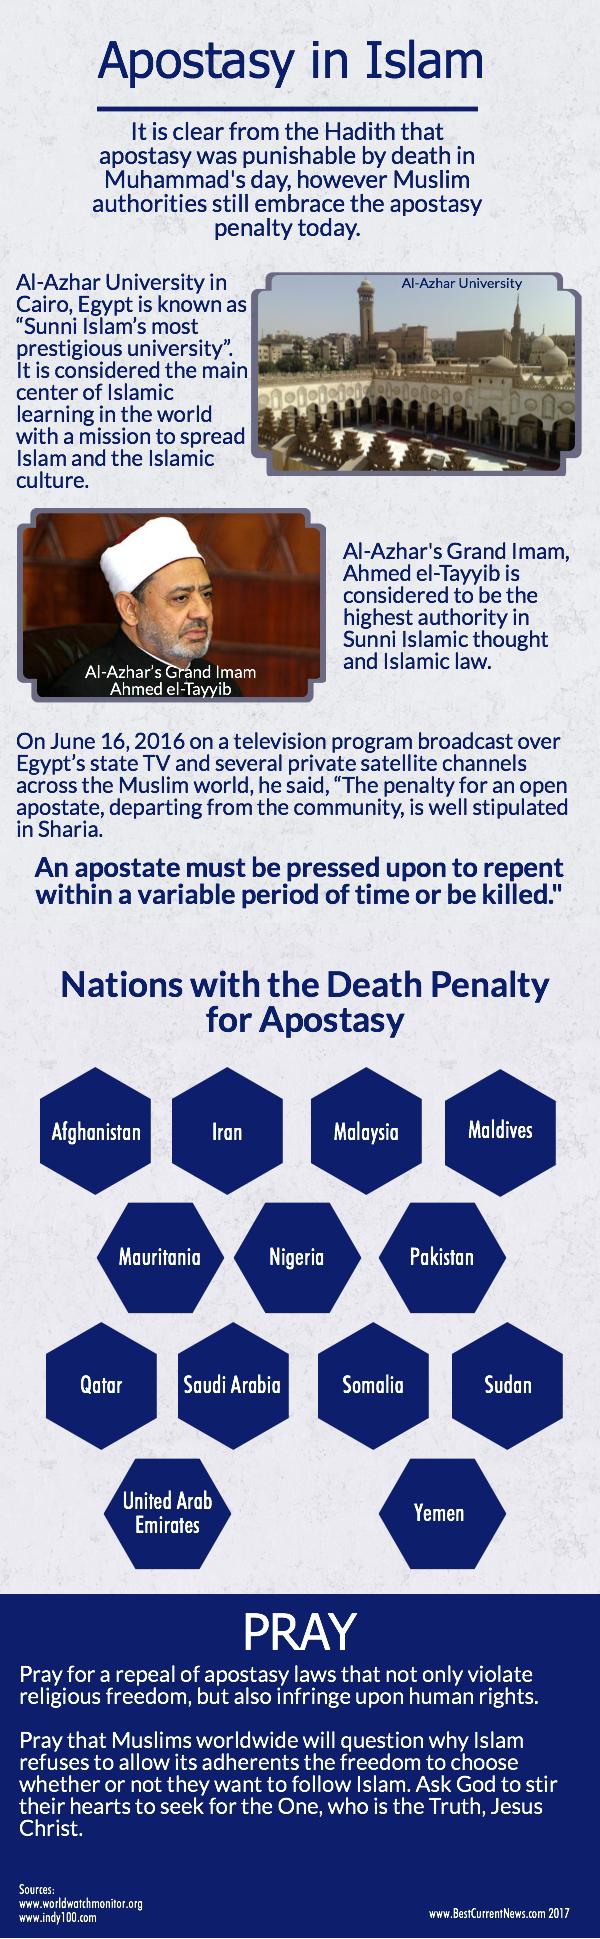 BCN Apostasy in Islam 2 Ramadan 2017.jpg